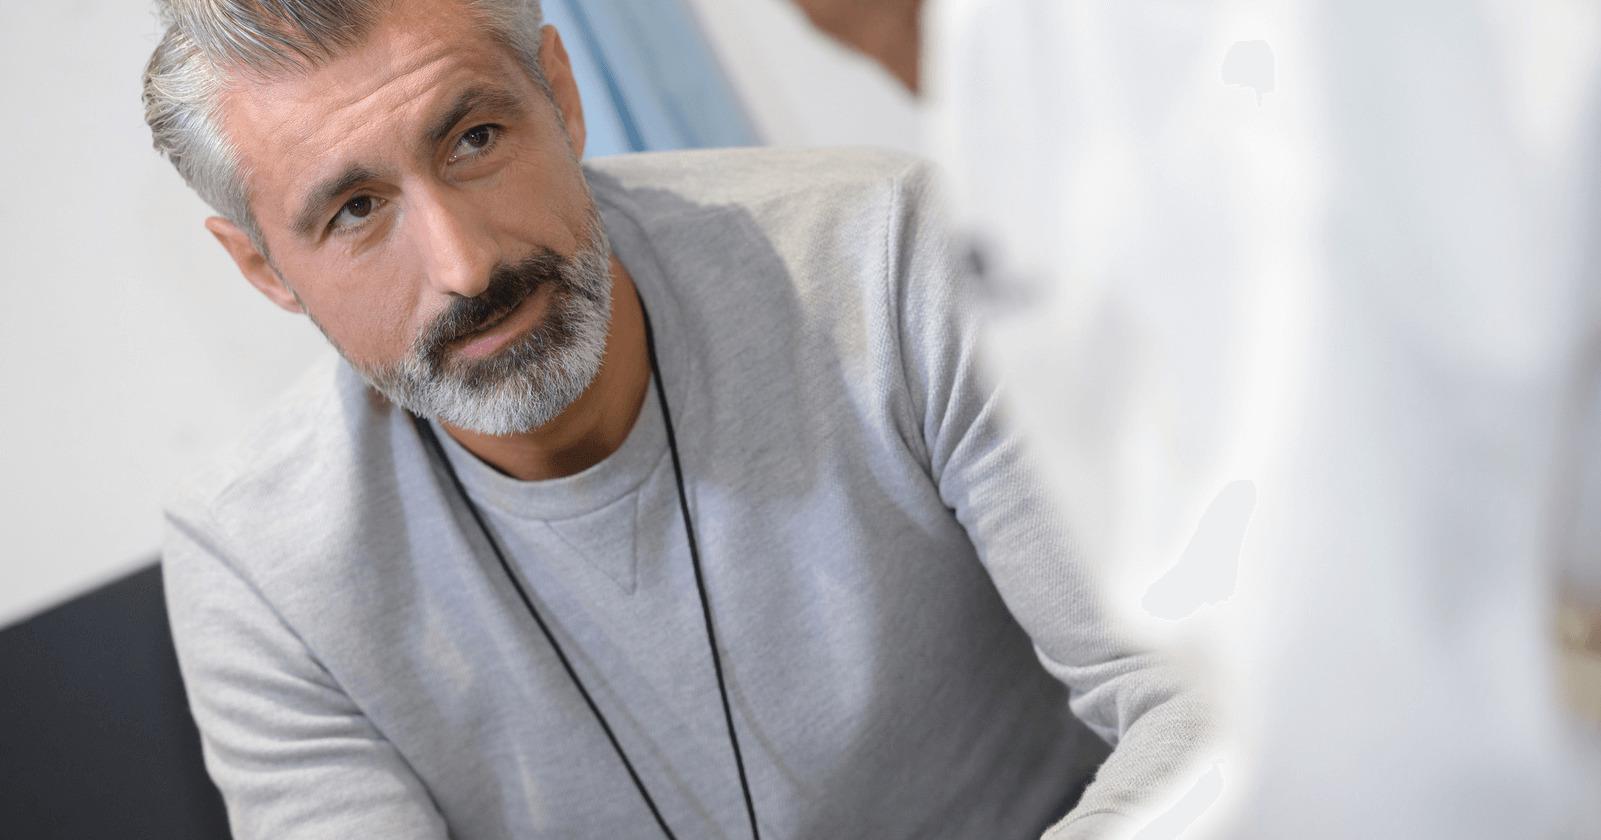 Mann bekommt die Diagnose Blut im Stuhl